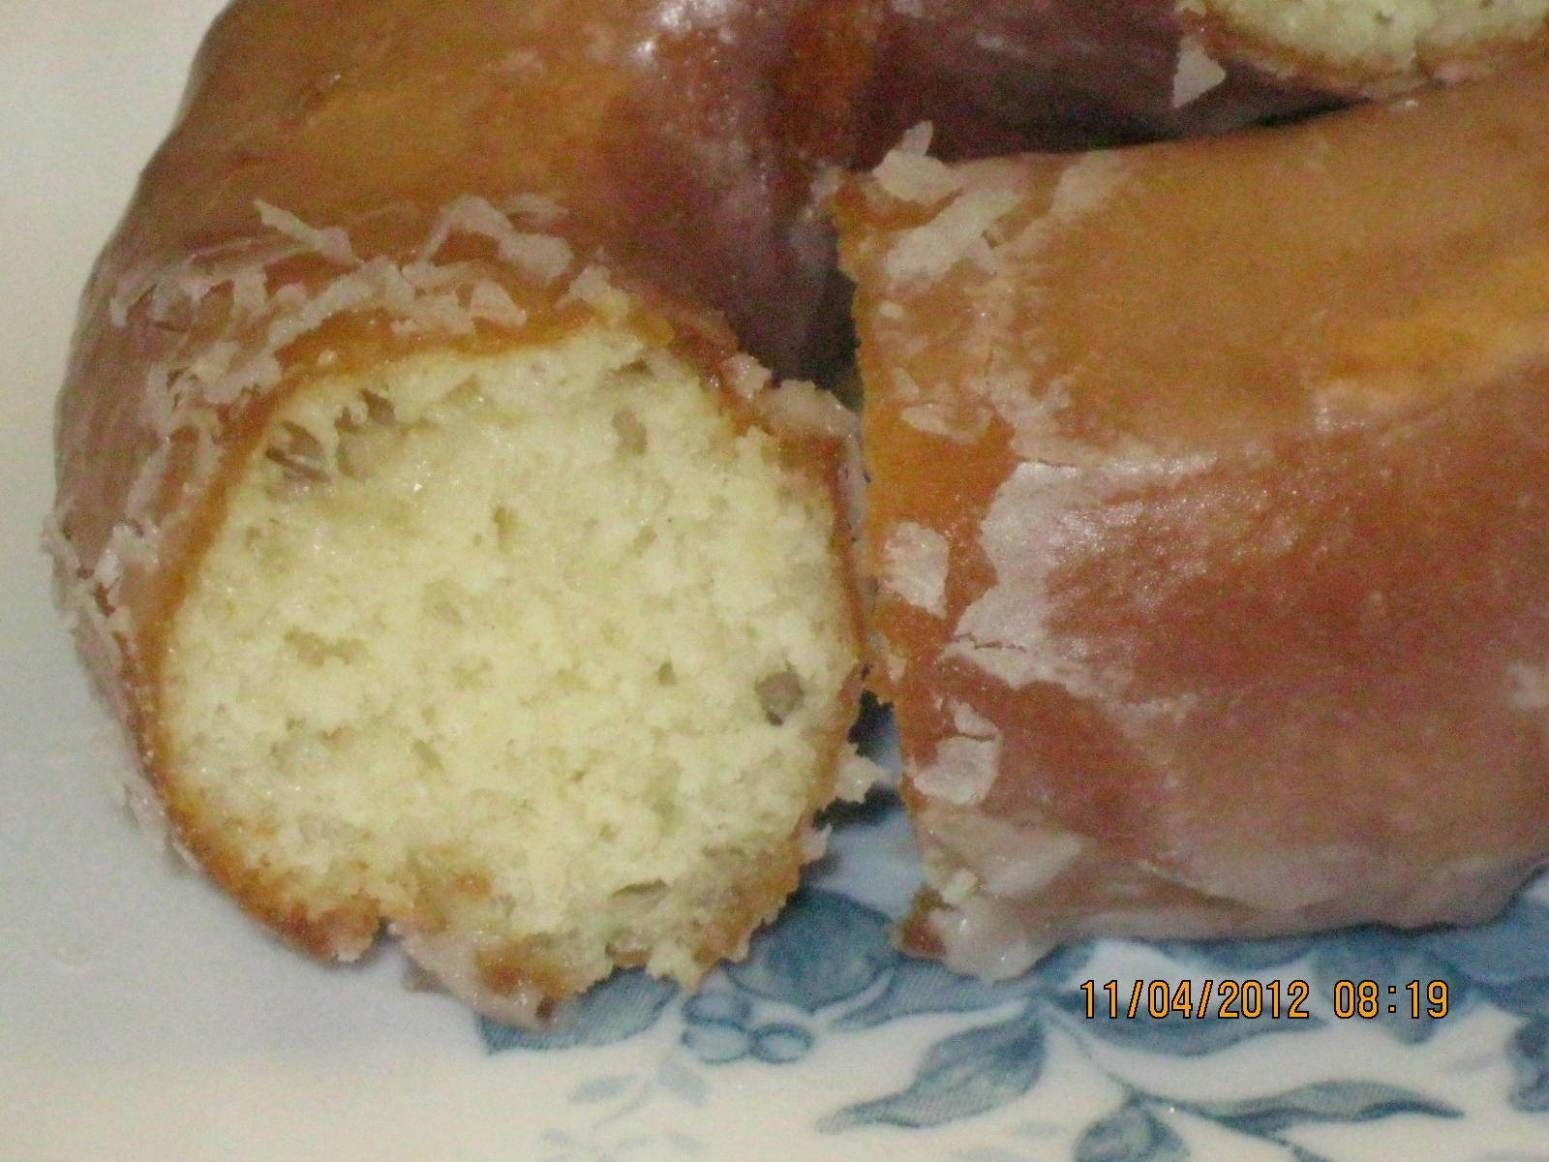 Glazed Raised Donuts Recipe